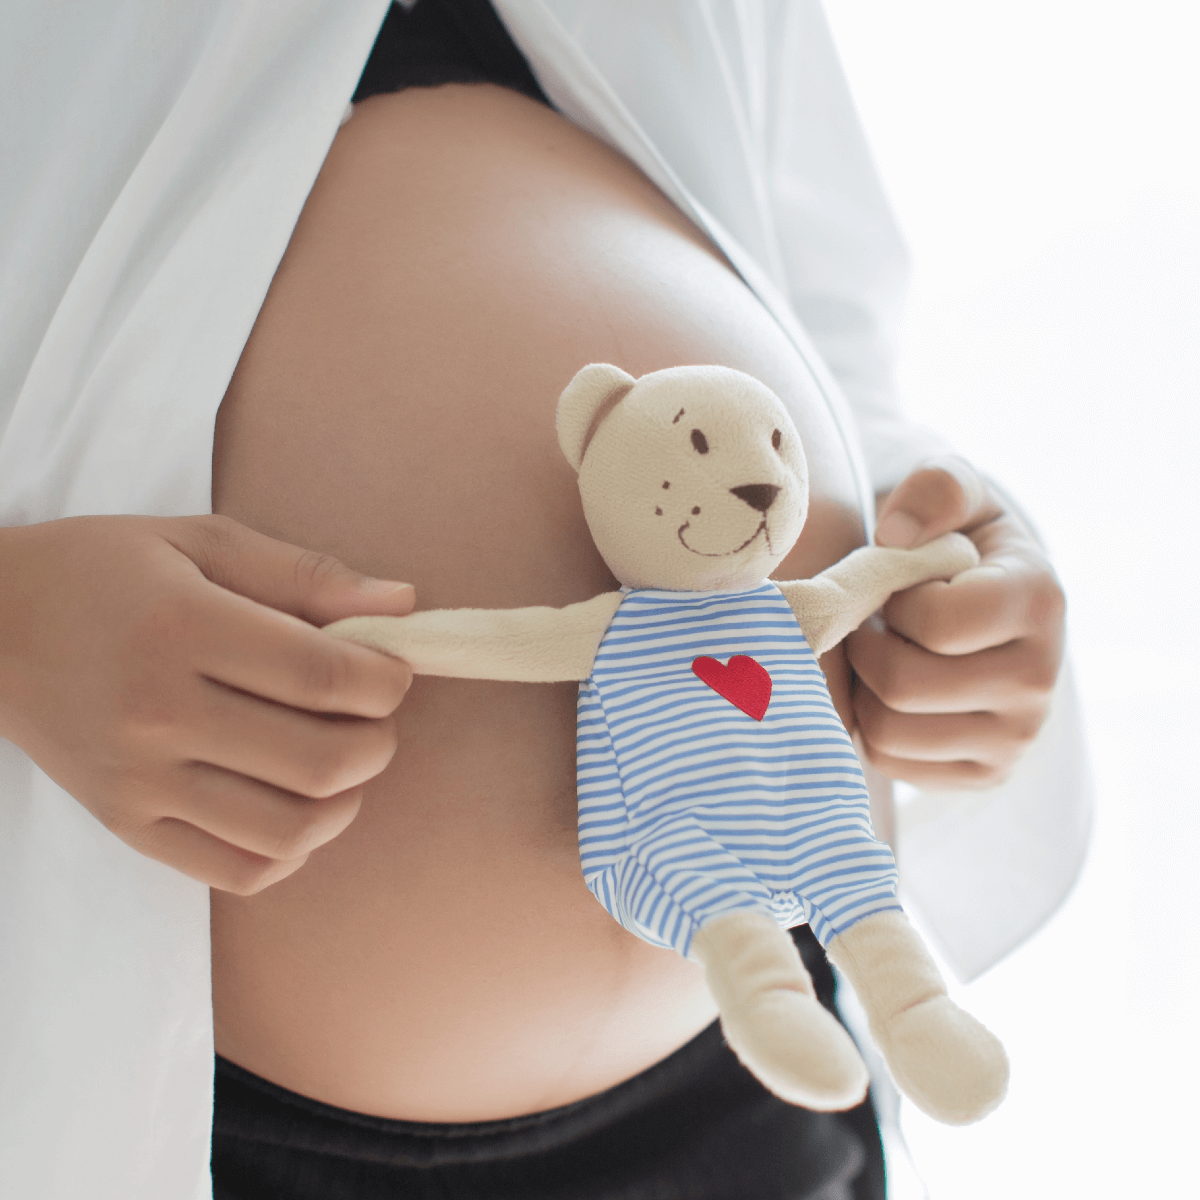 mujer embarazada con peluche